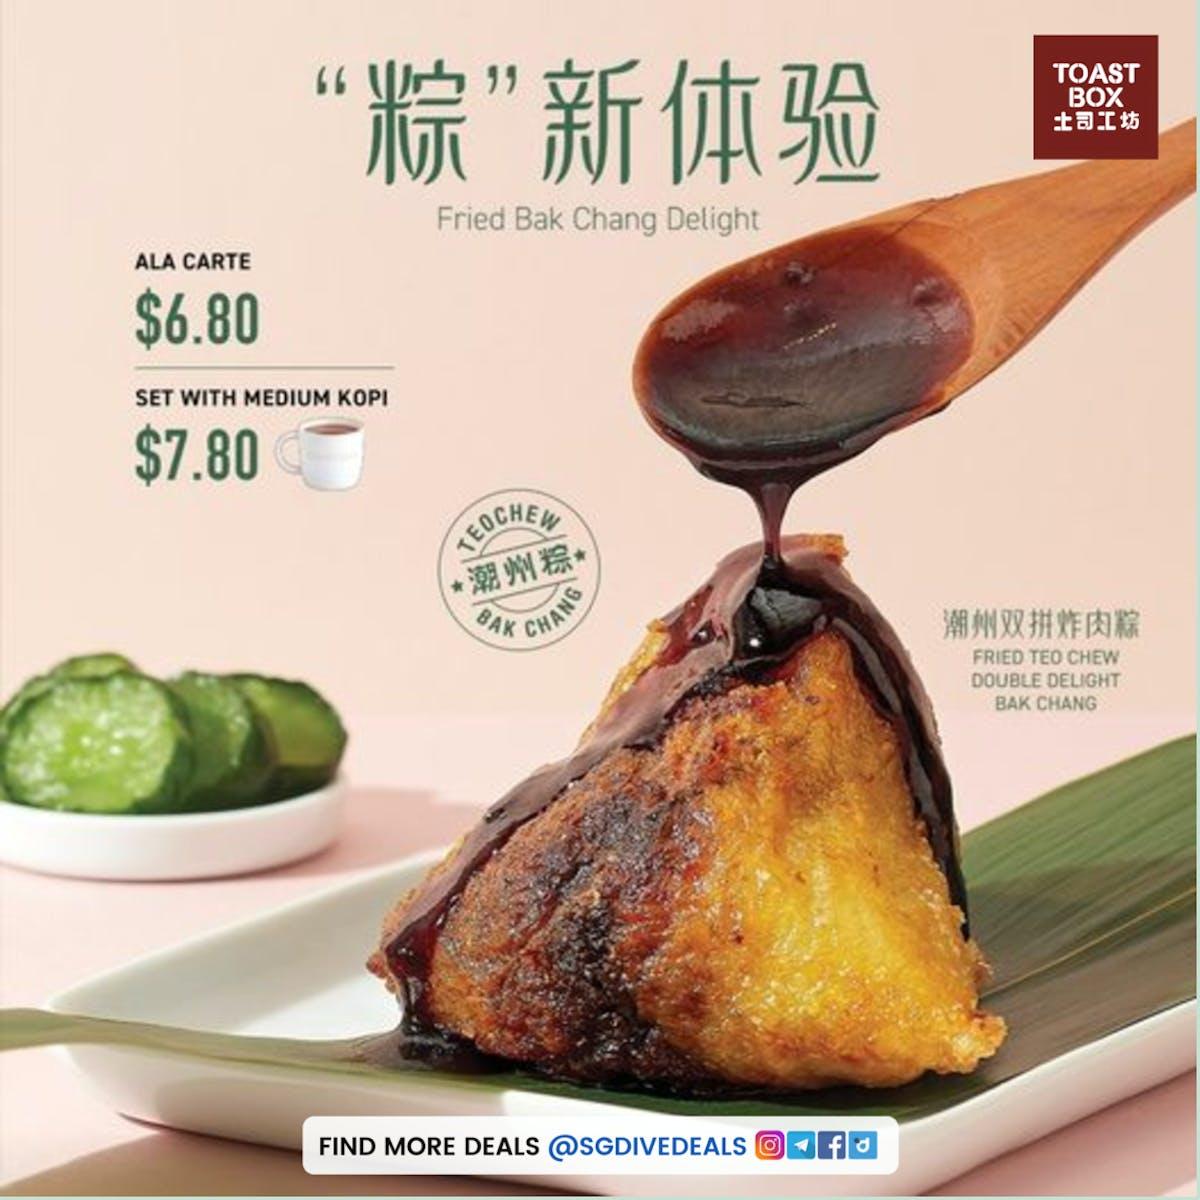 Double Delight Bak Chang- deep fried!